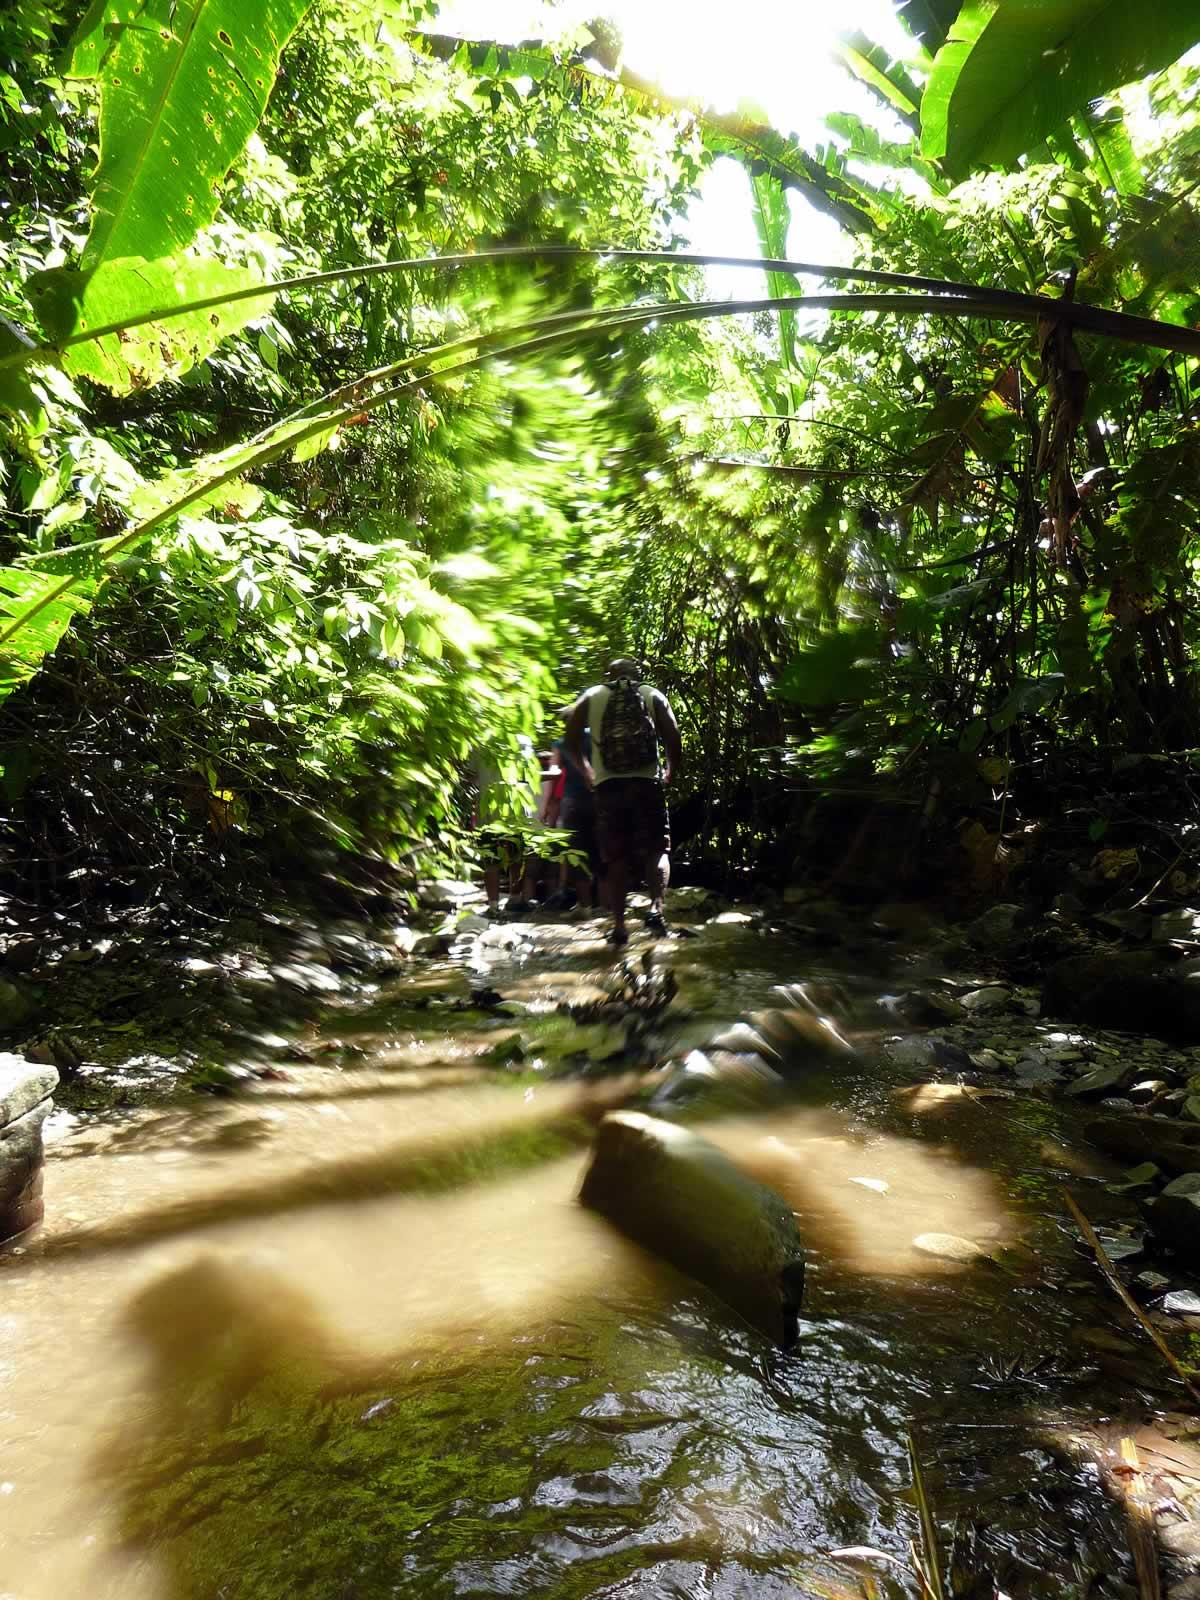 Covigne River Gorge Destination Trinidad and Tobago